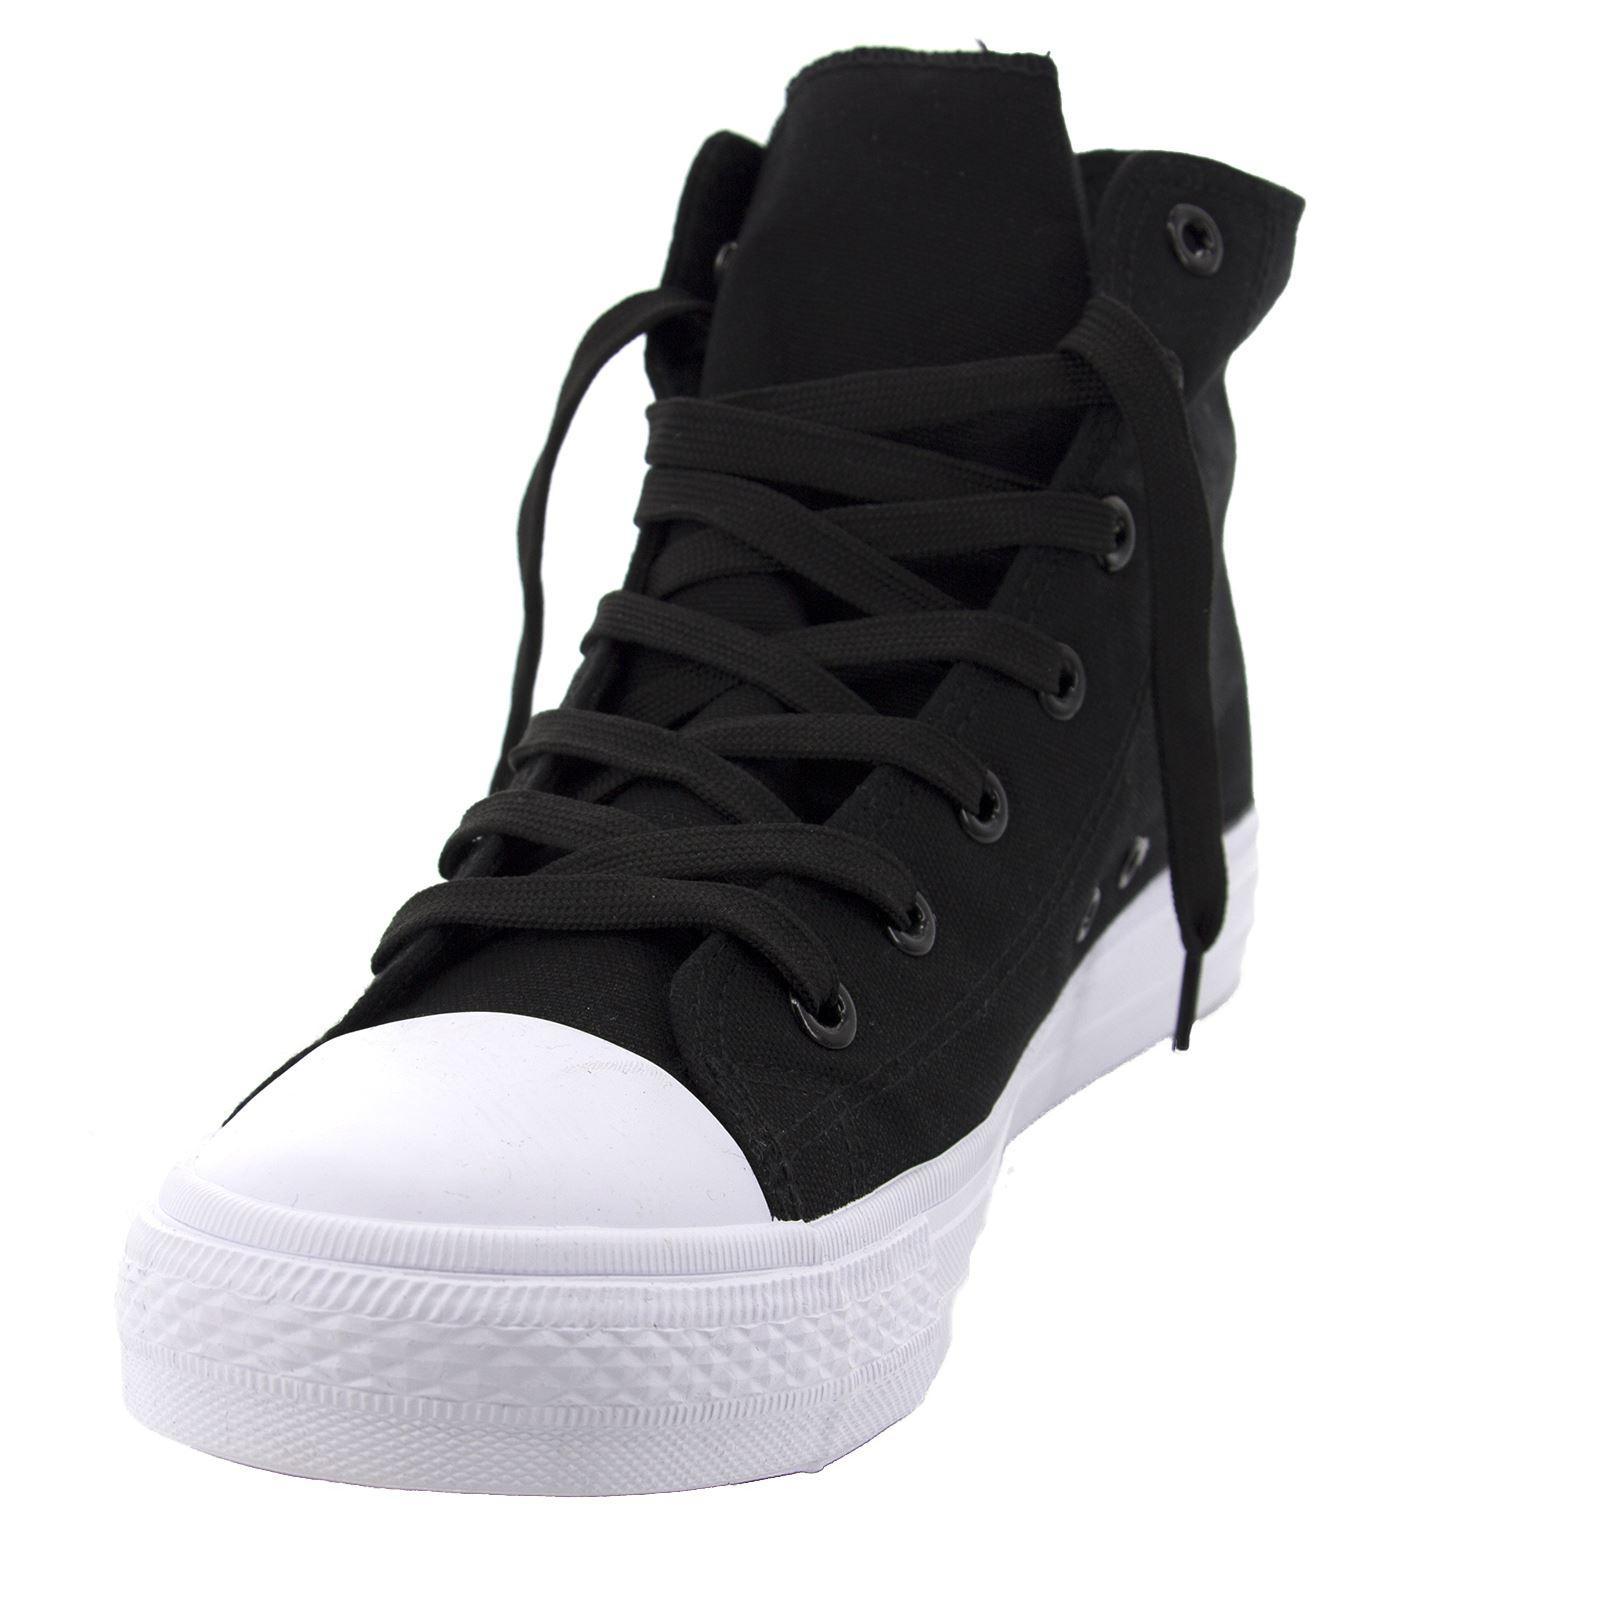 Scarpe da Ginnastica Uomo Donna Sneakers Alte Casual Comode Vari Colori Nero 43 TVaHjC